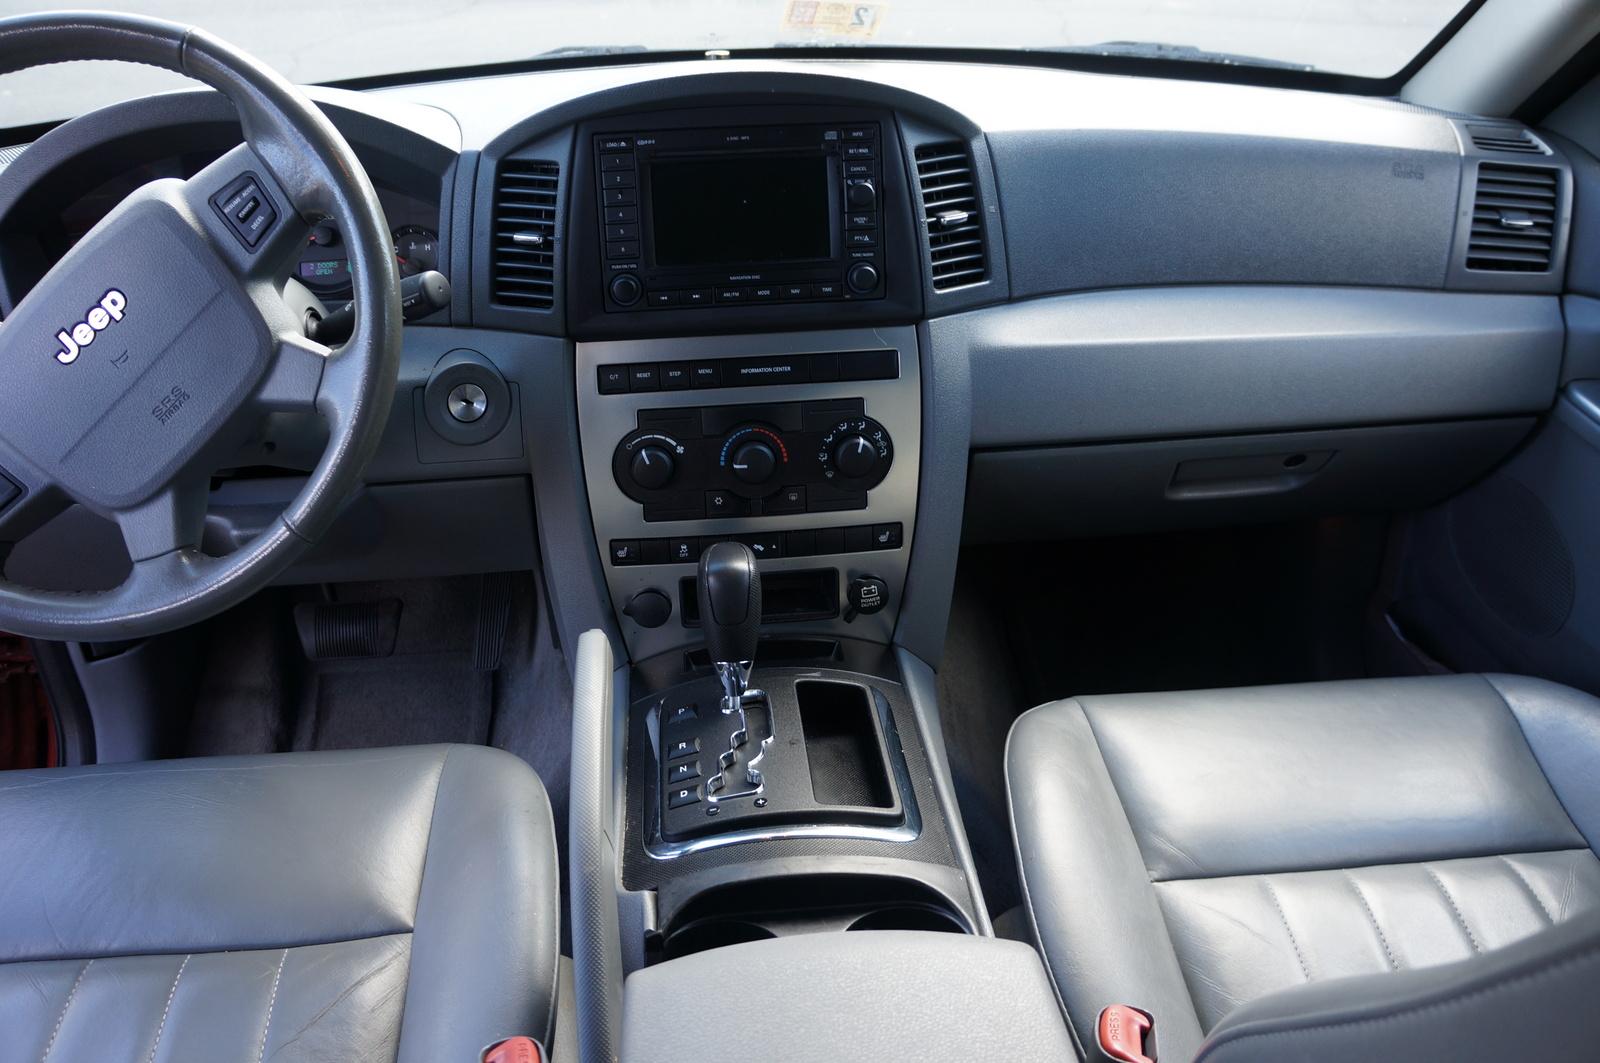 2002 Jeep Grand Cherokee Laredo >> 2006 Jeep Grand Cherokee - Pictures - CarGurus